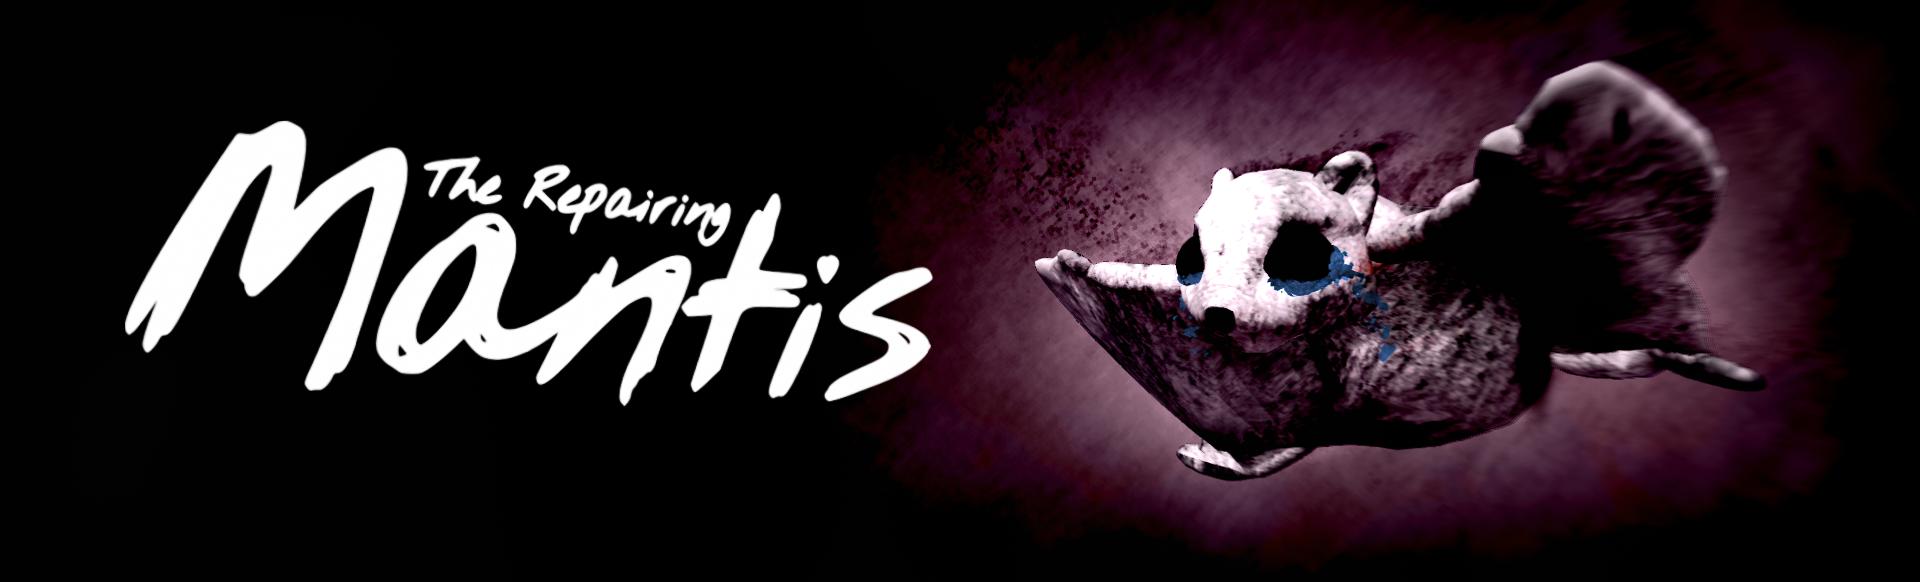 The Repairing Mantis